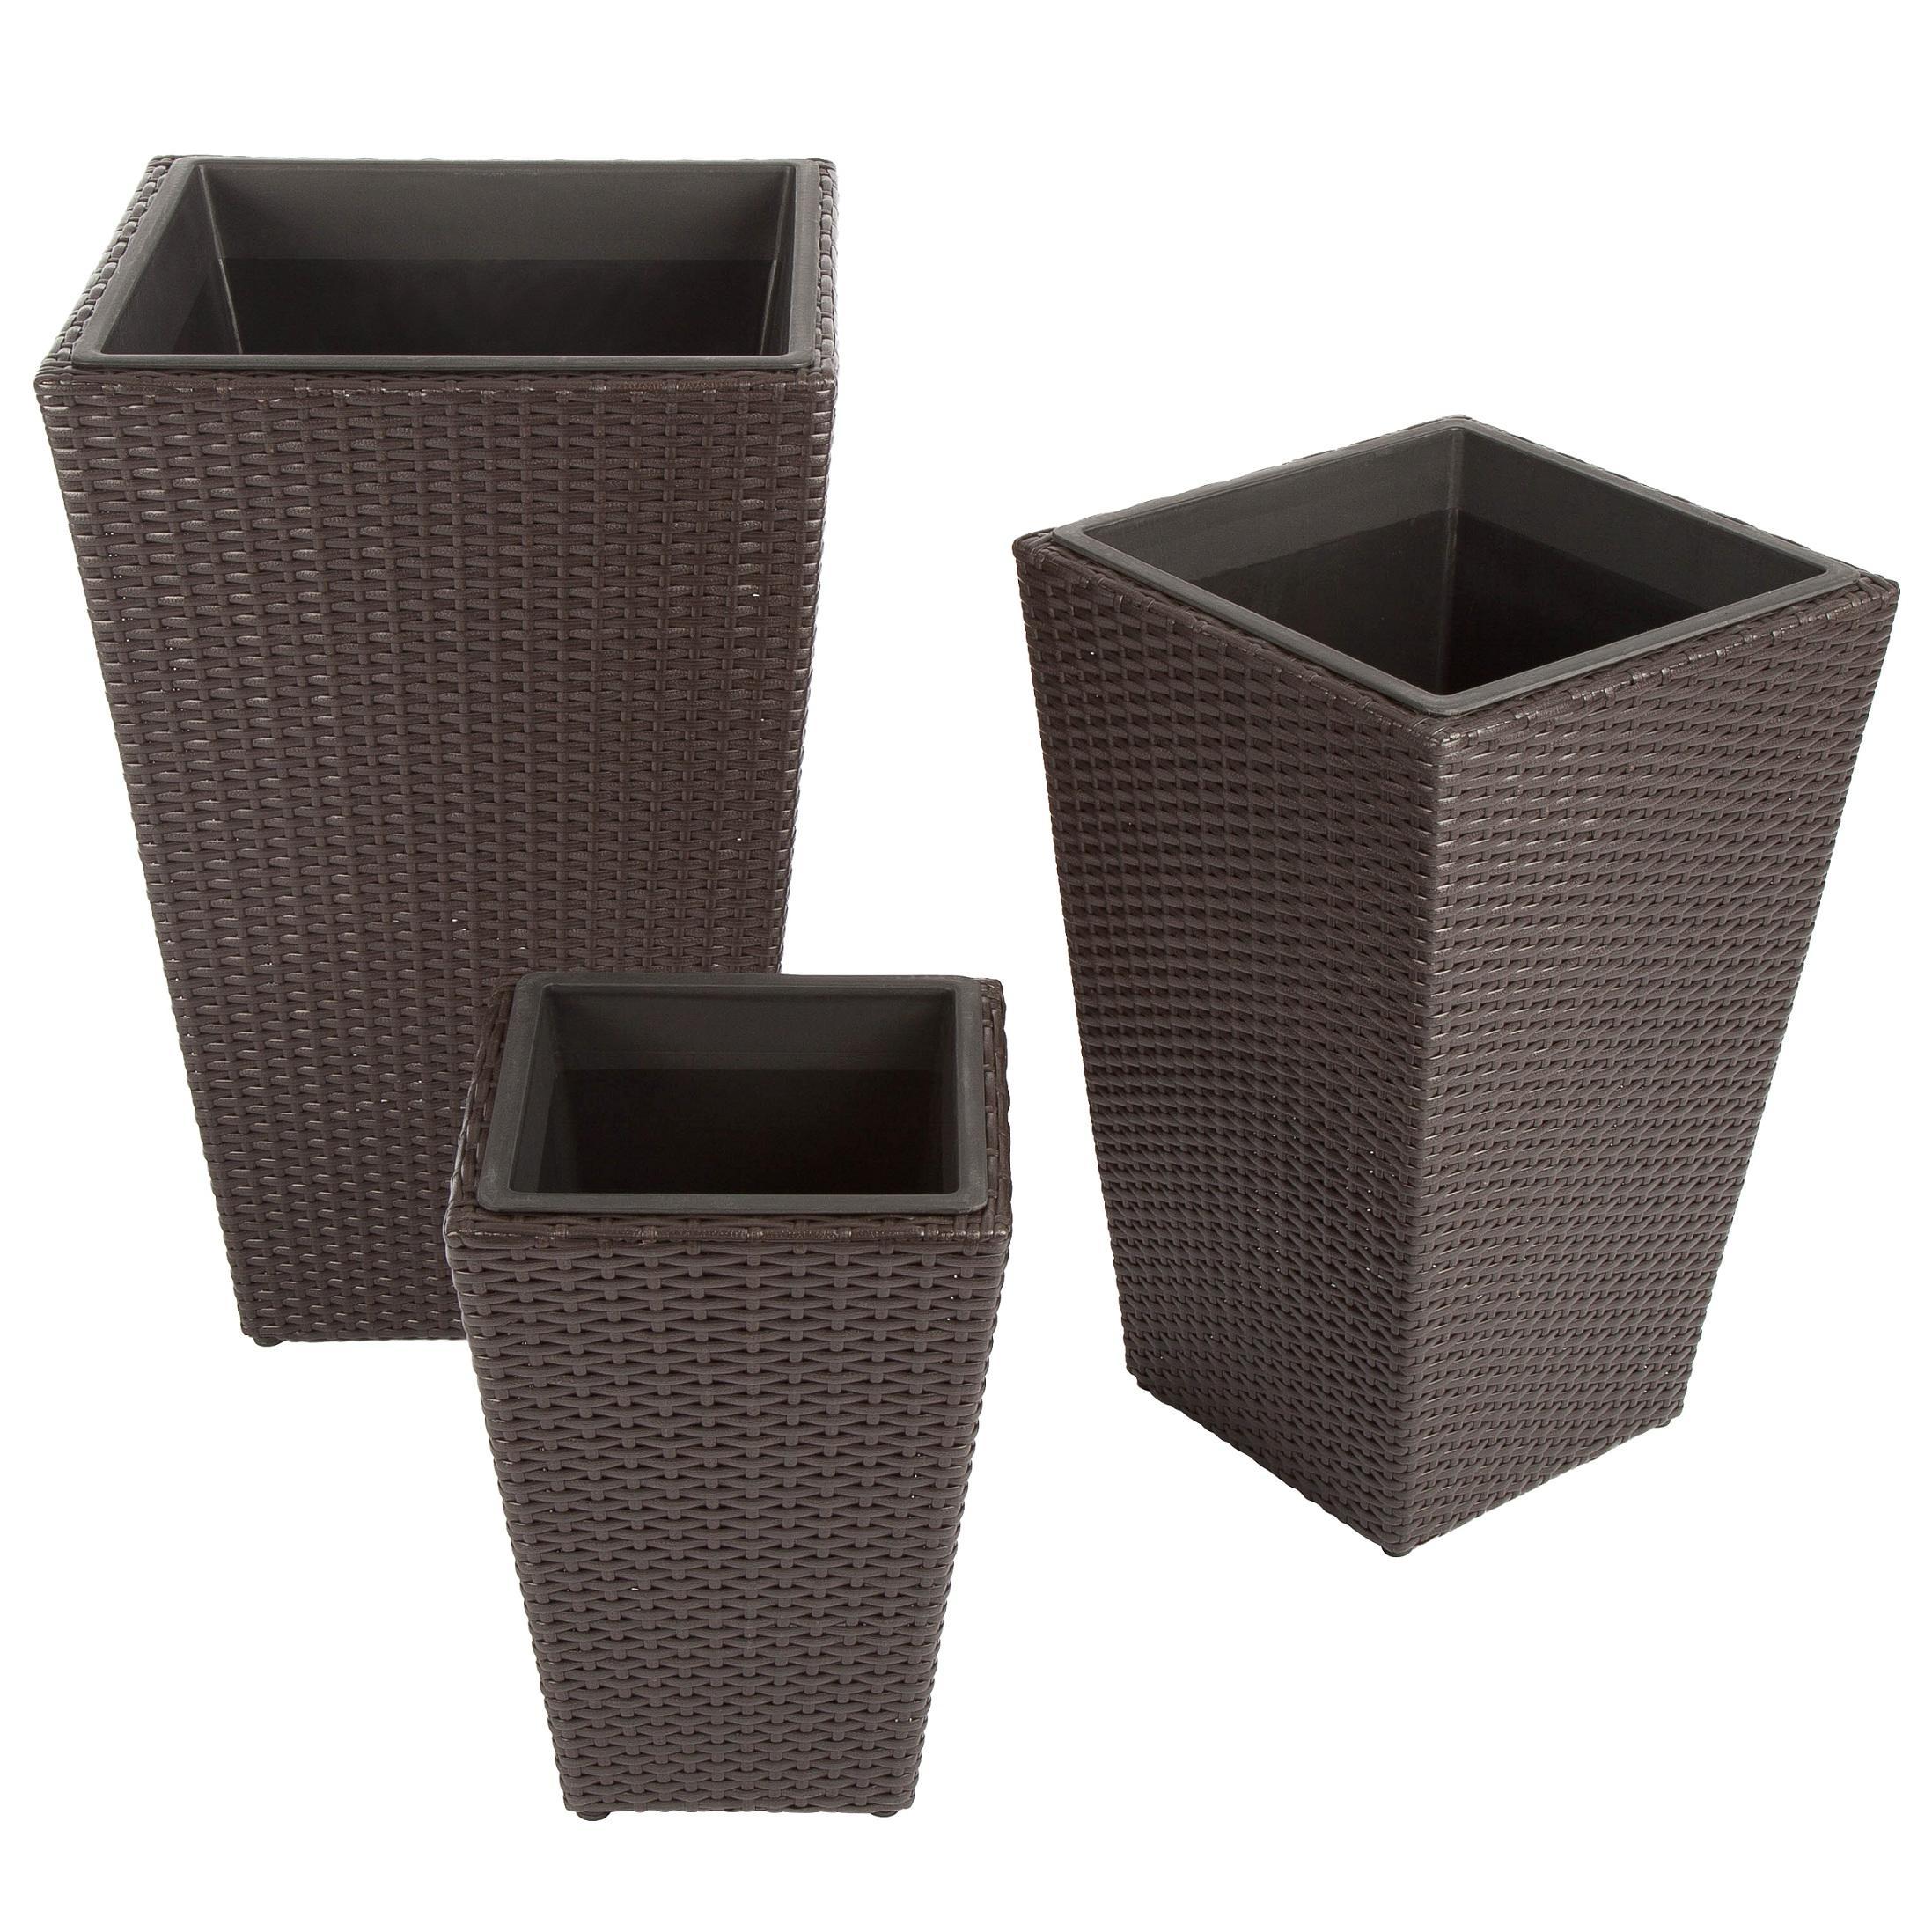 ultranatura poly rattan pflanzk bel 3er set palma serie. Black Bedroom Furniture Sets. Home Design Ideas